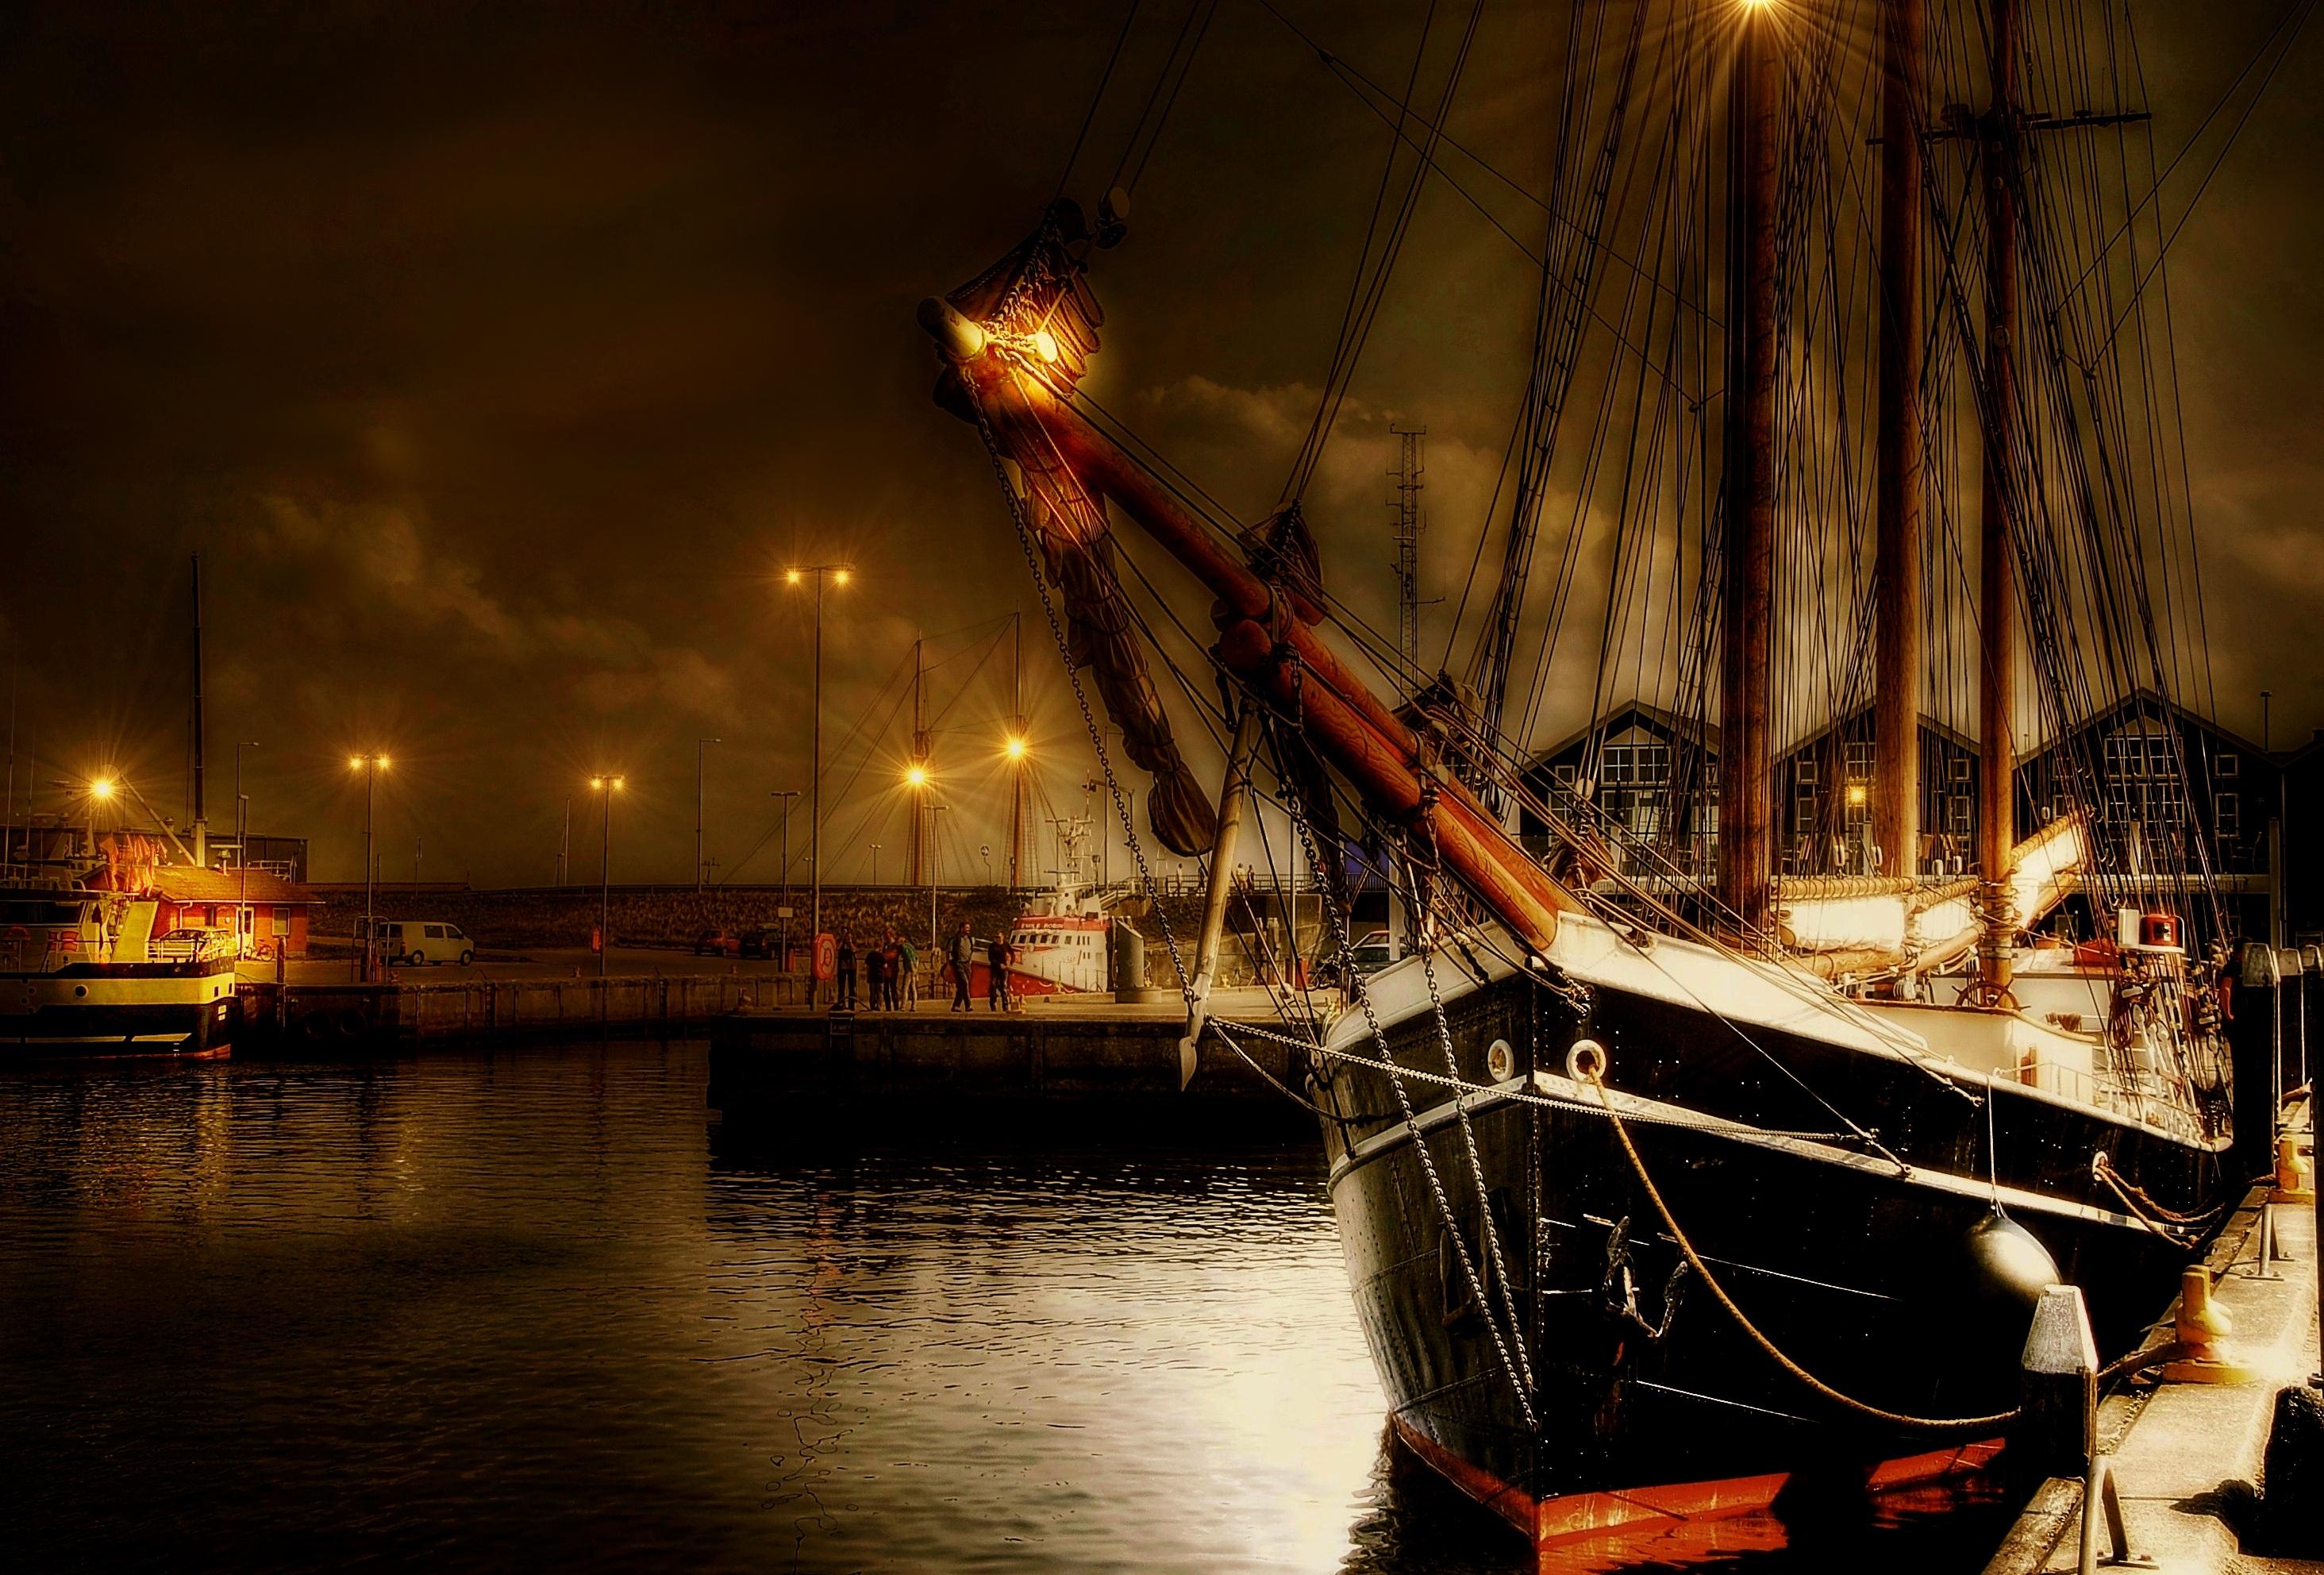 Sailing vessel photo